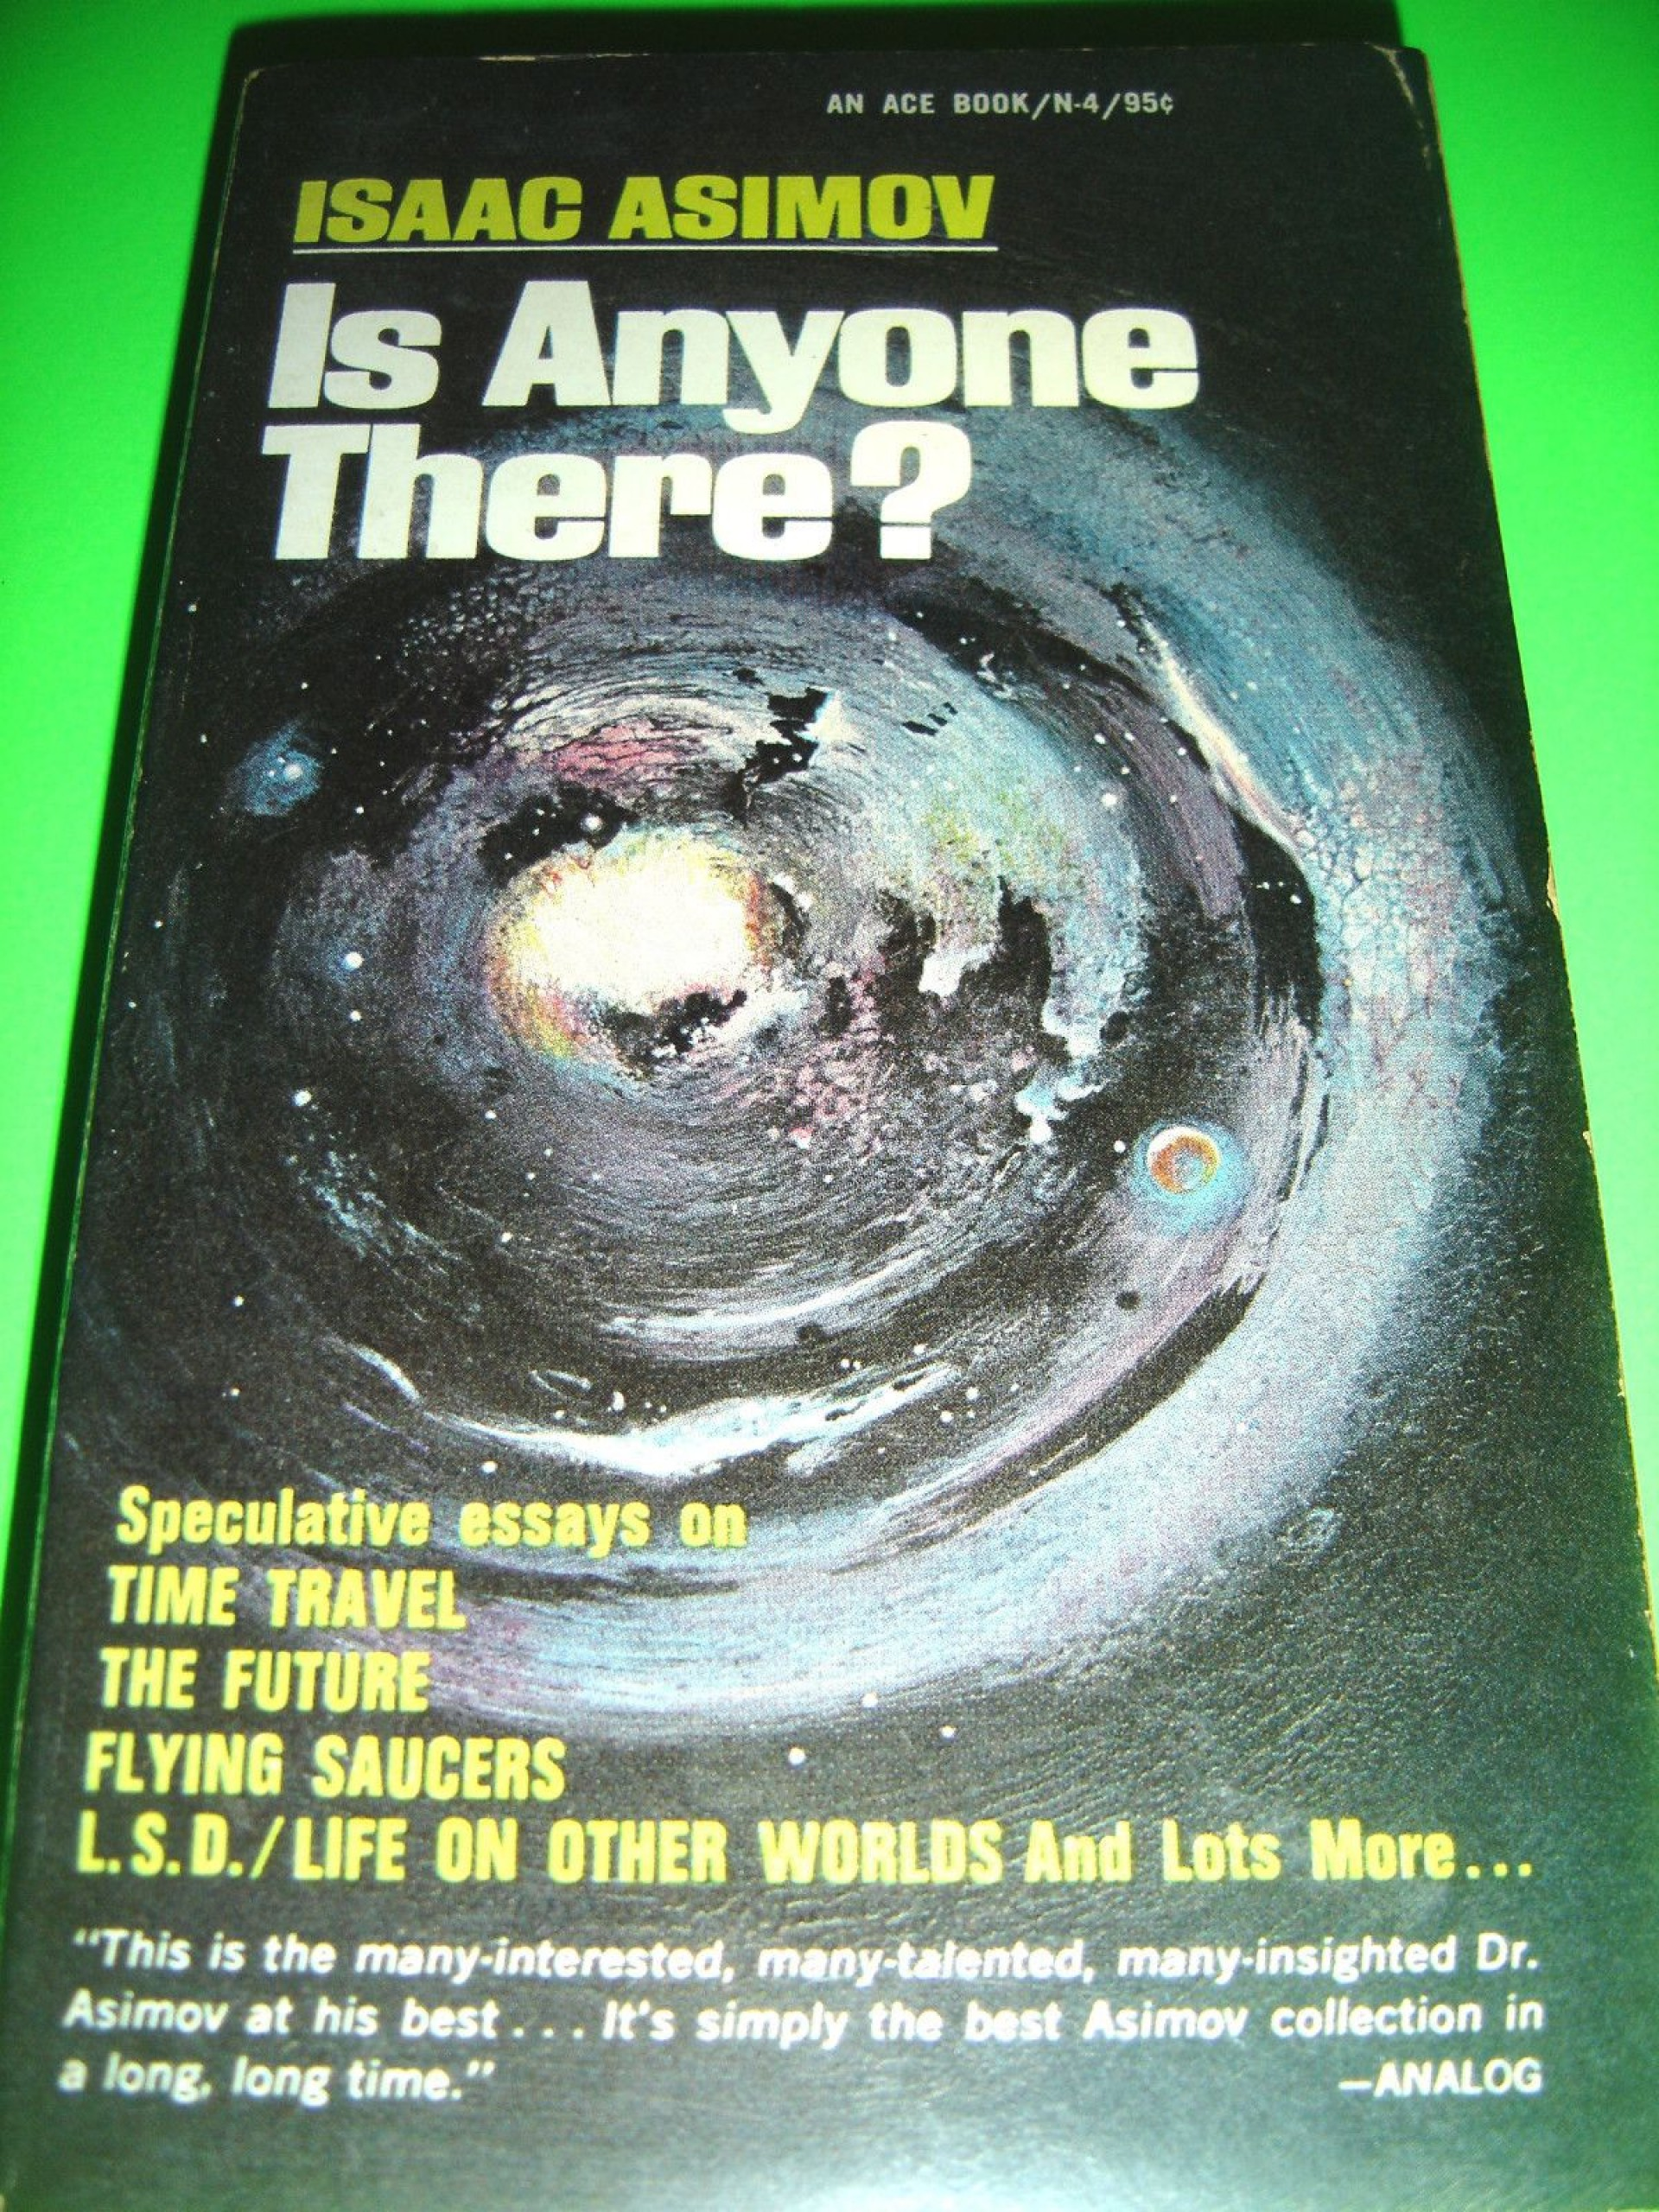 027 Isaac Asimov Essays Essay Awful On Creativity Intelligence 1920